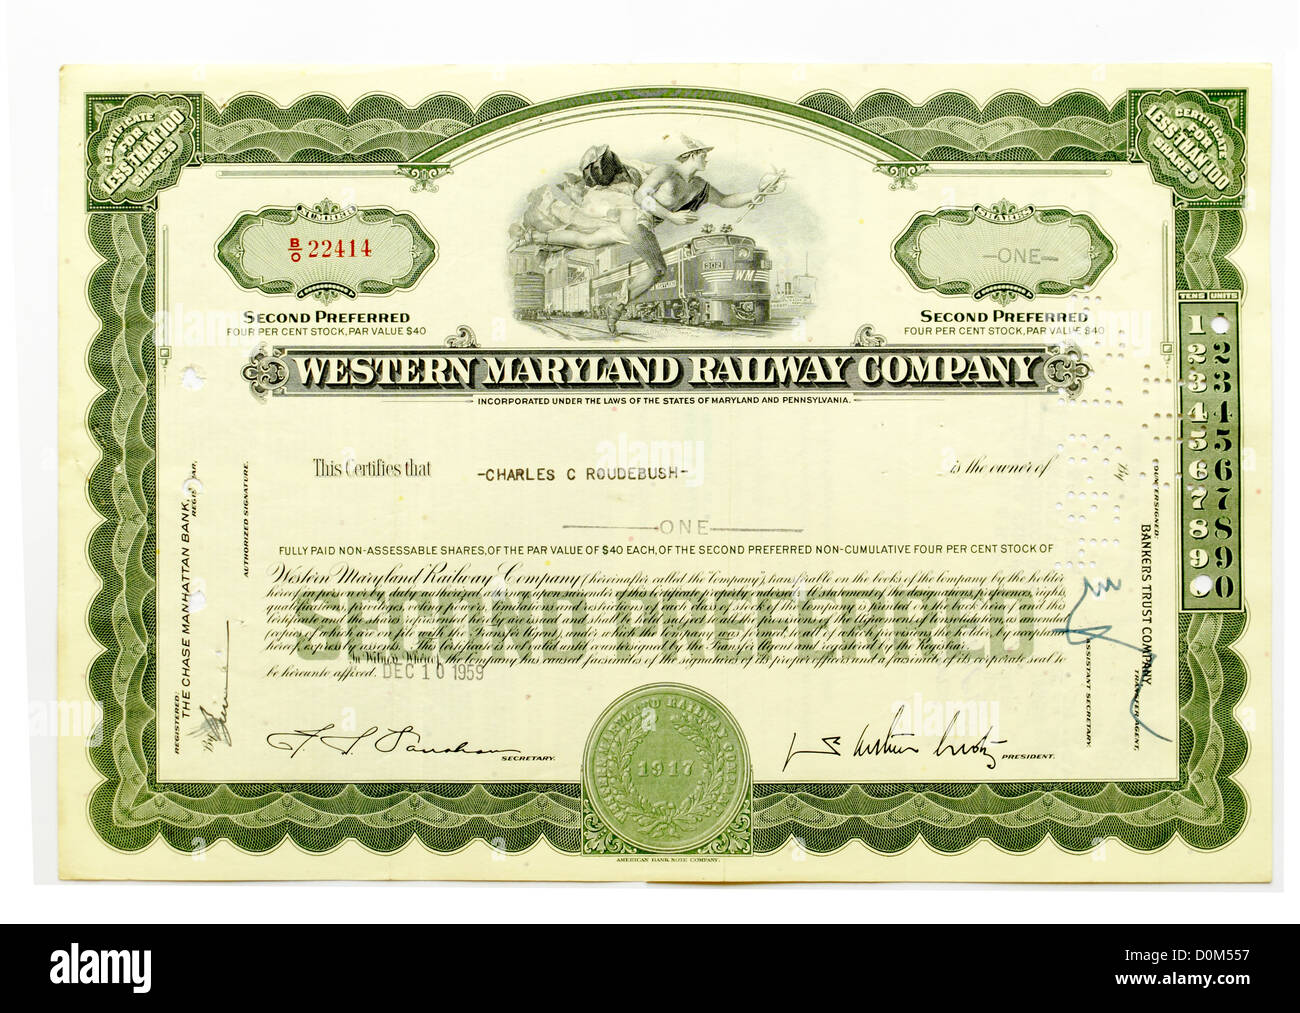 American Telephone & Telegraph Company (AT&T) Stock